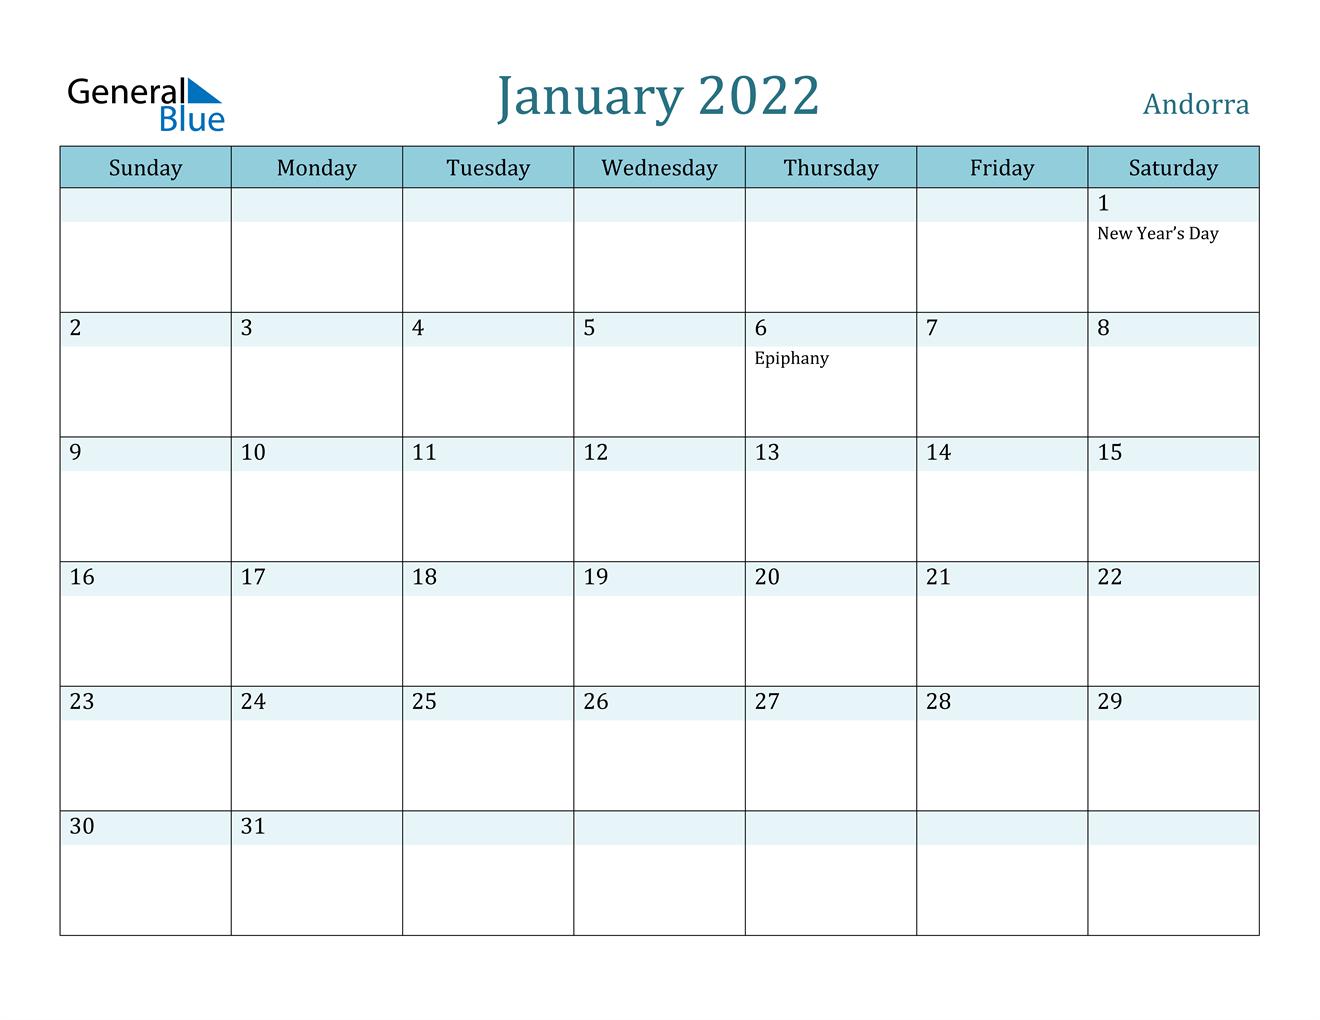 Andorra January 2022 Calendar With Holidays Inside Free Printable Calendar Templates January 2022